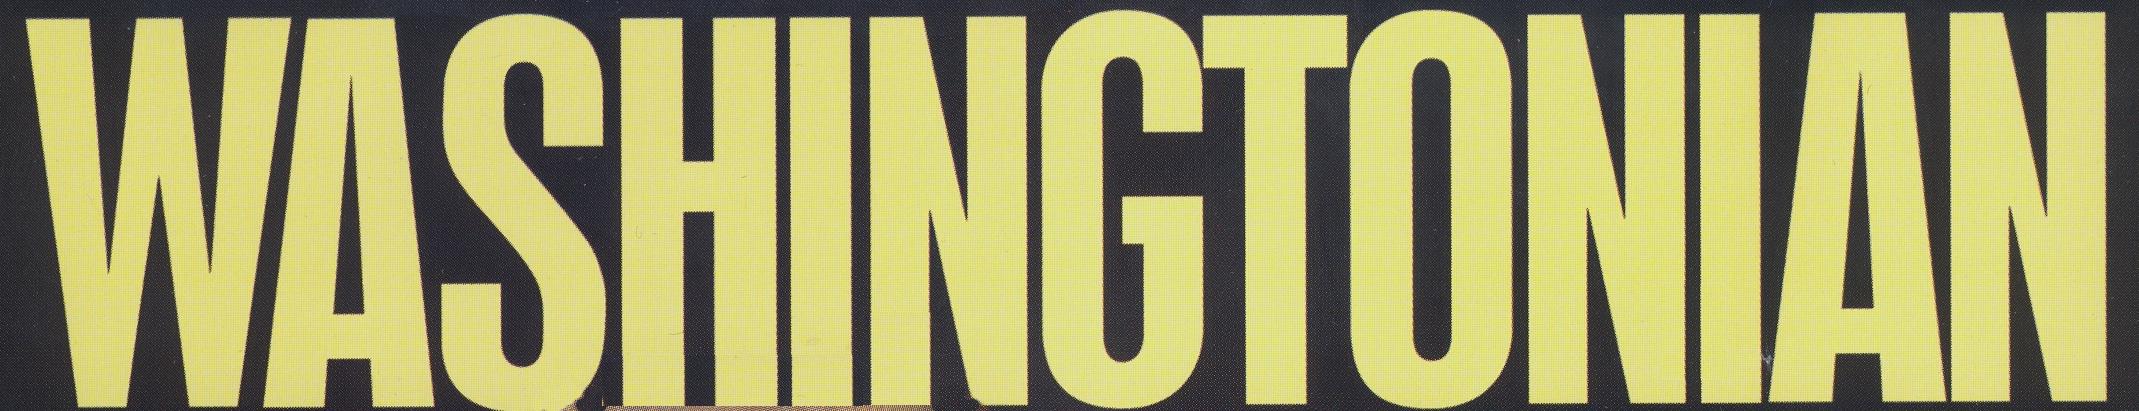 Washingtonian Logo 2